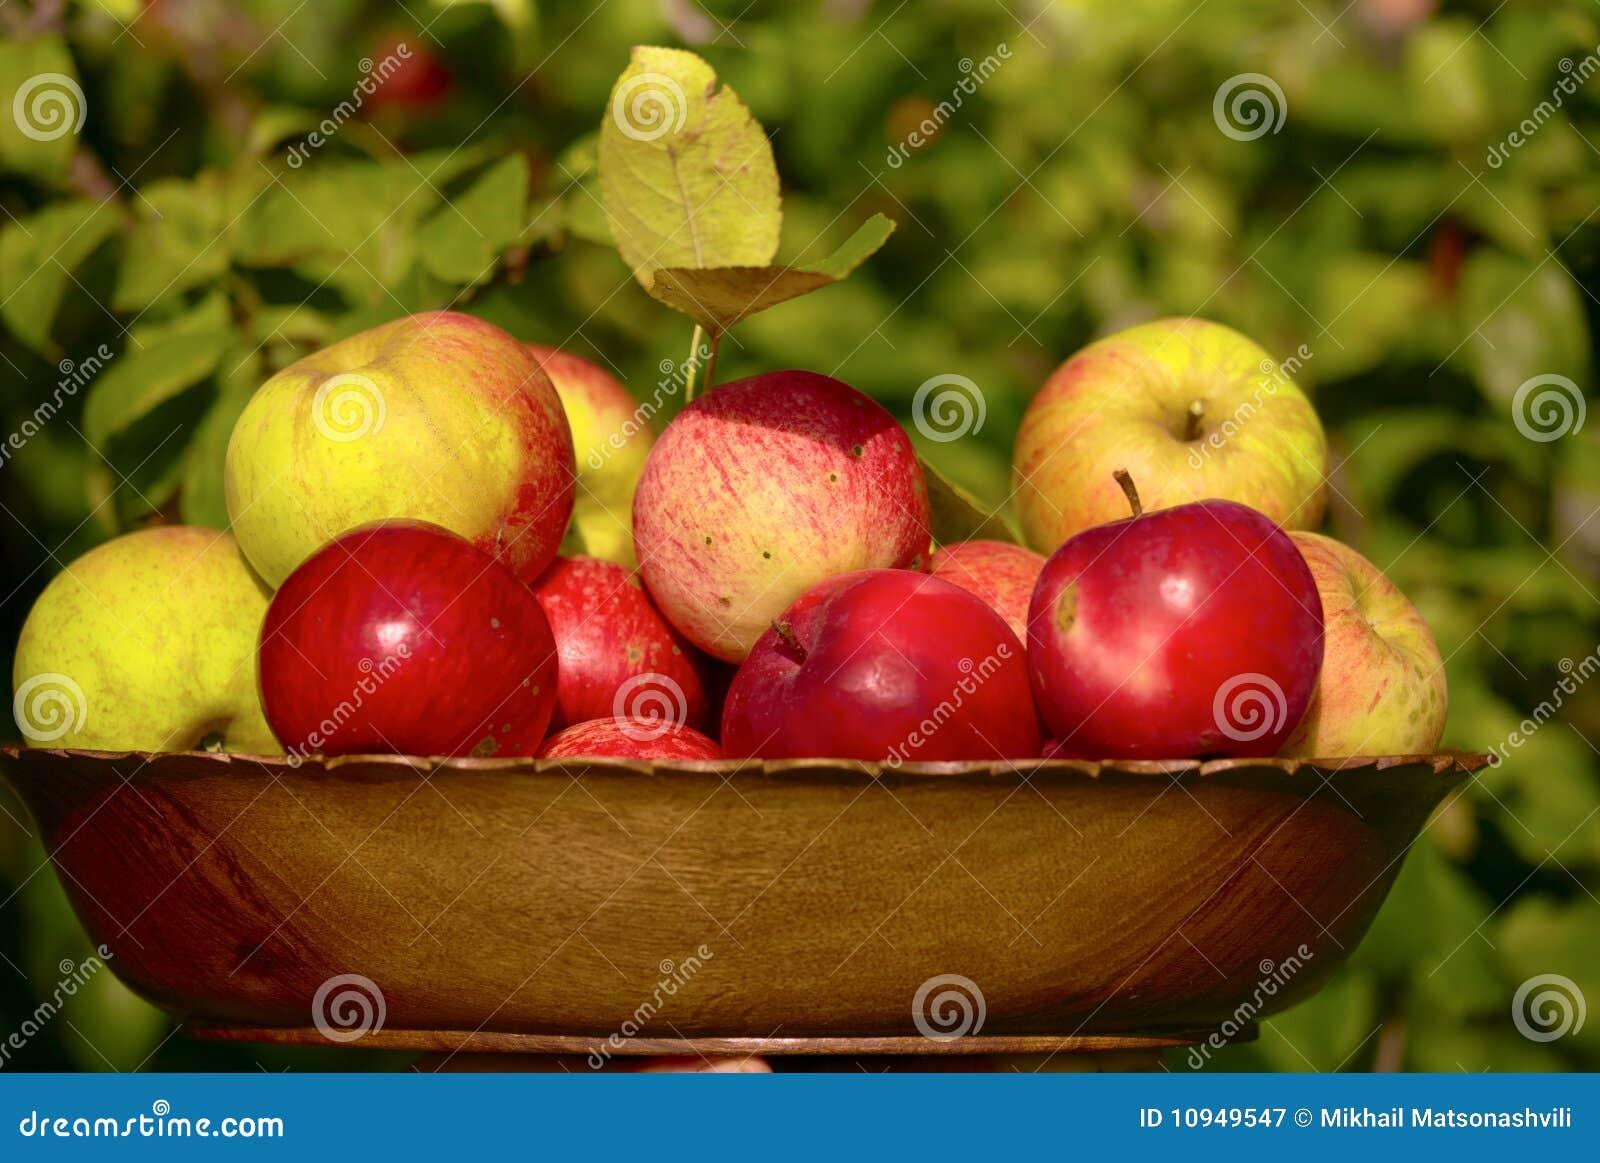 тарелка яблок